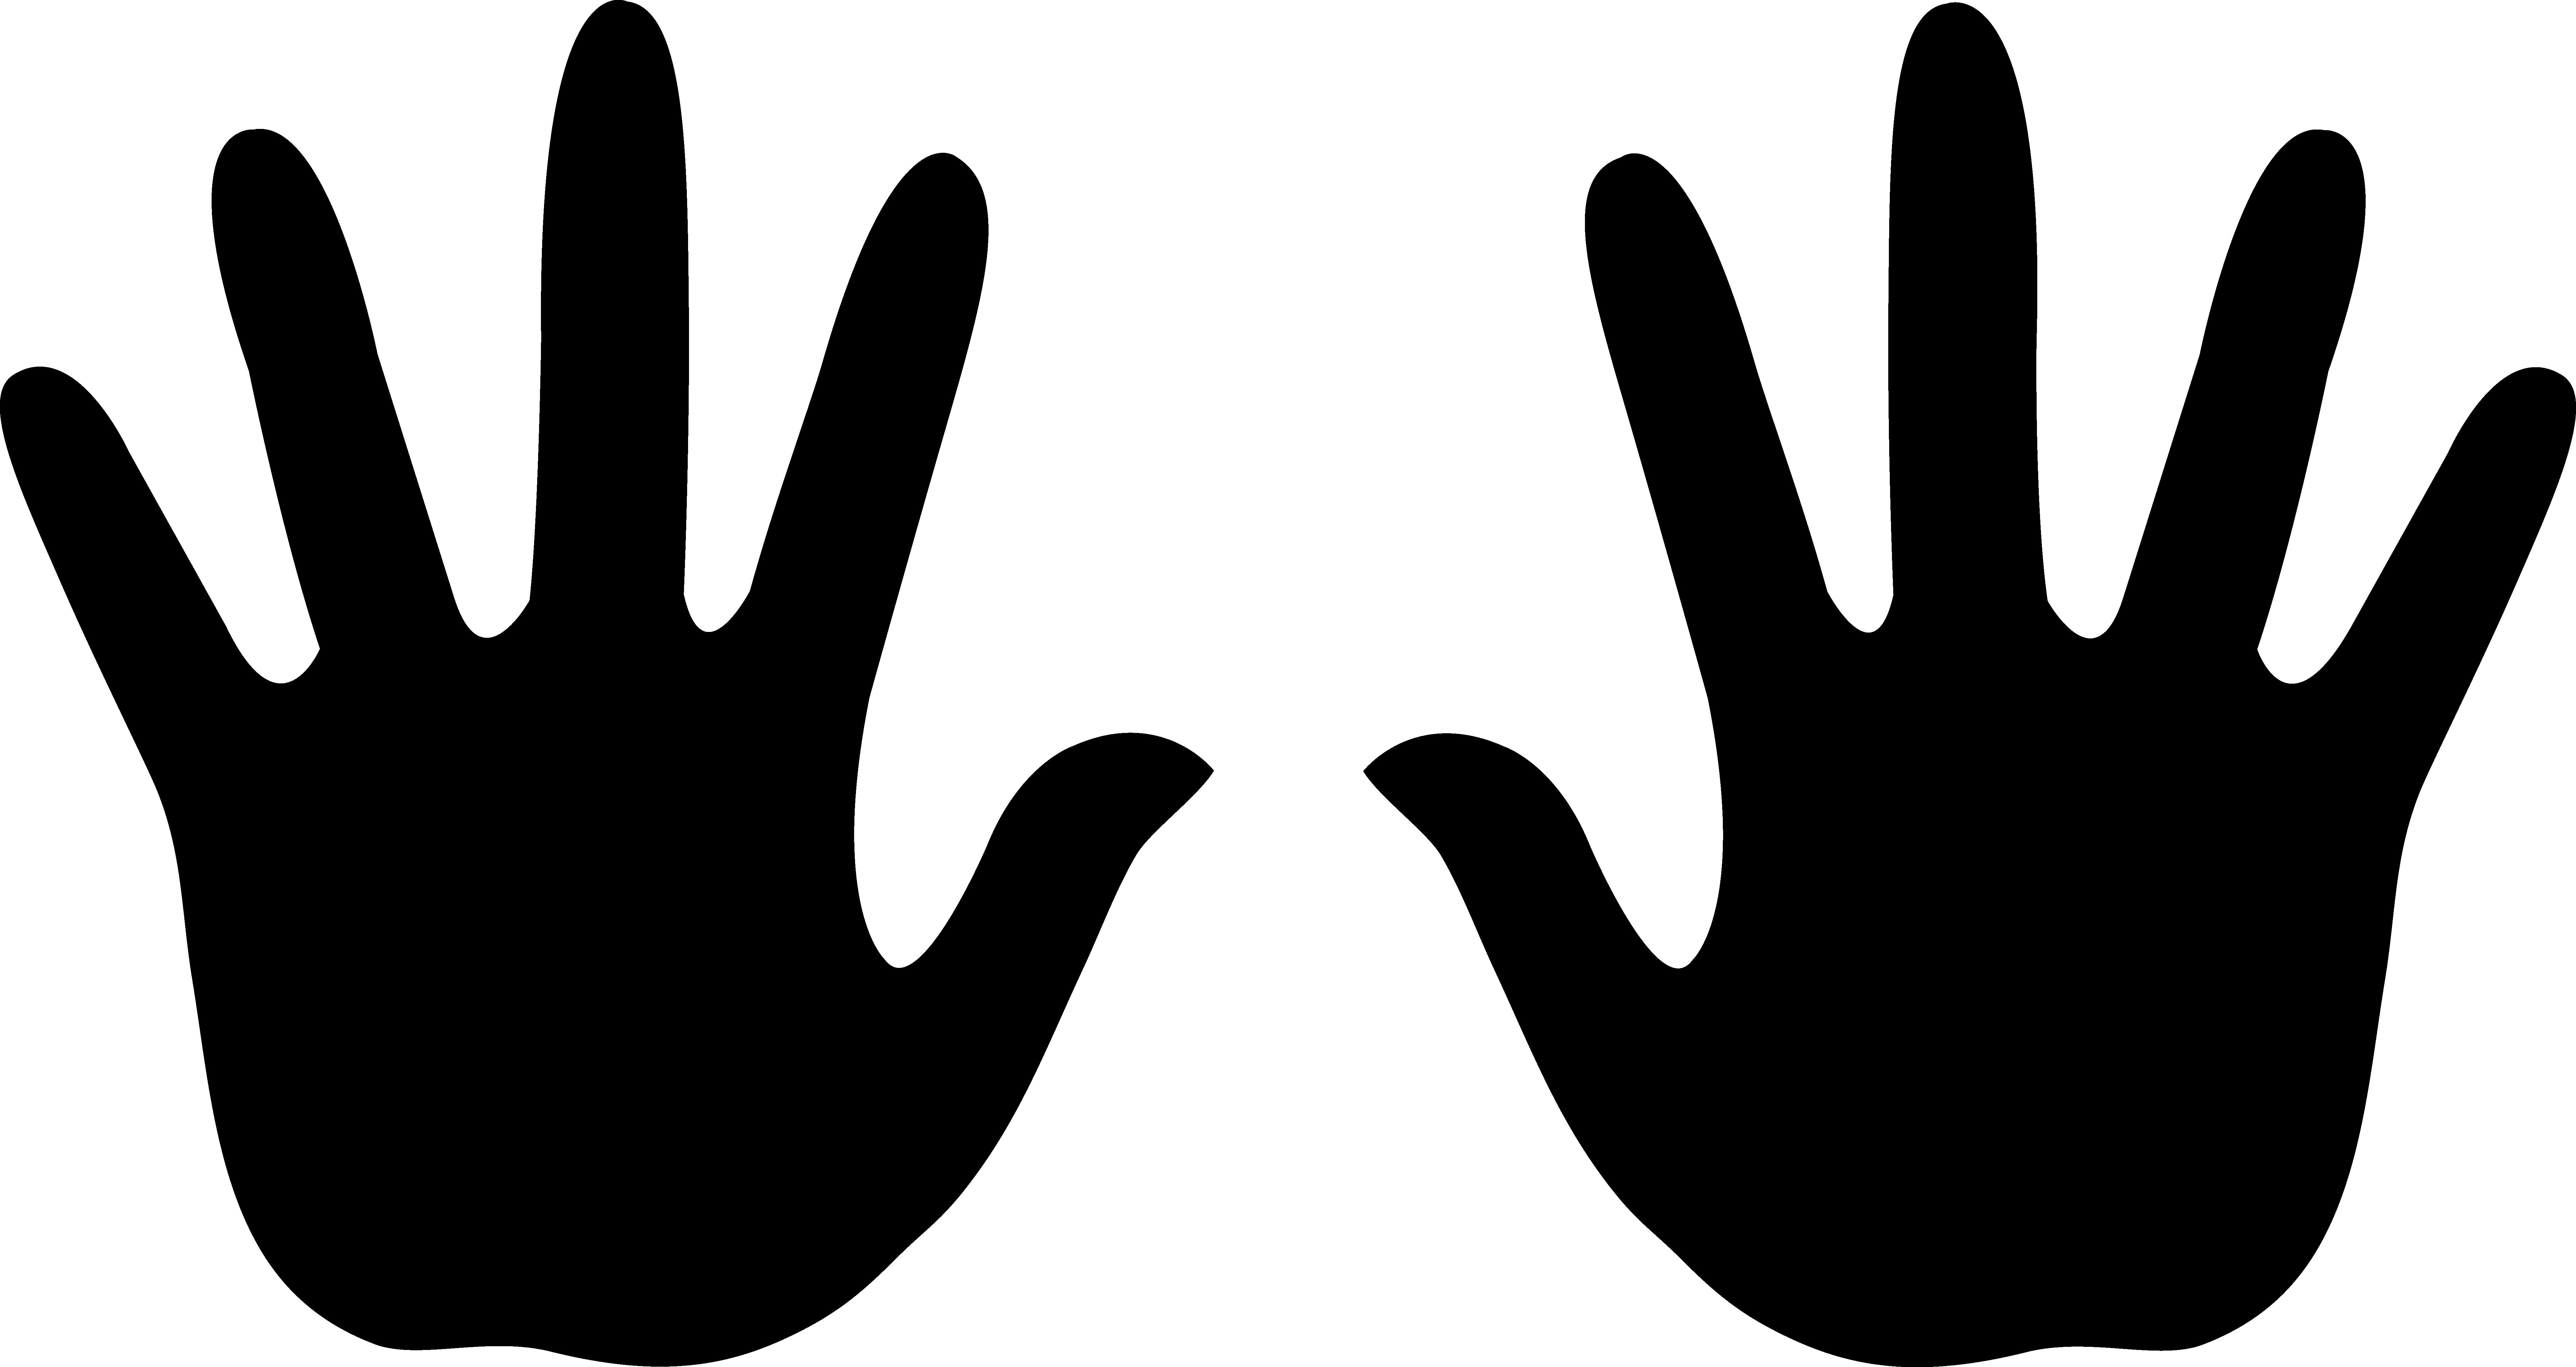 8315x4411 Silhouette Clipart Hand